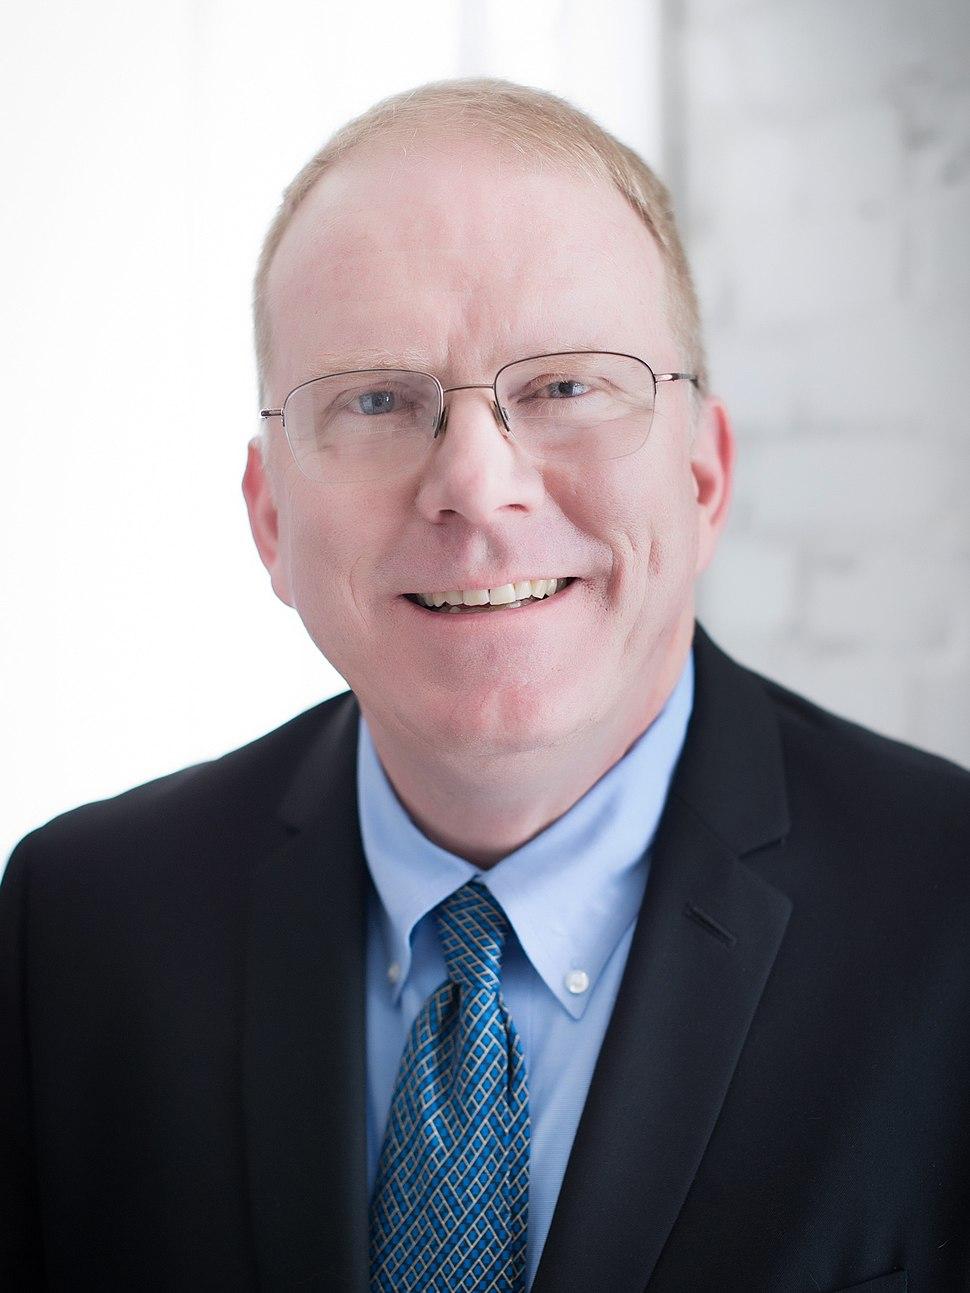 Jeffrey Beall